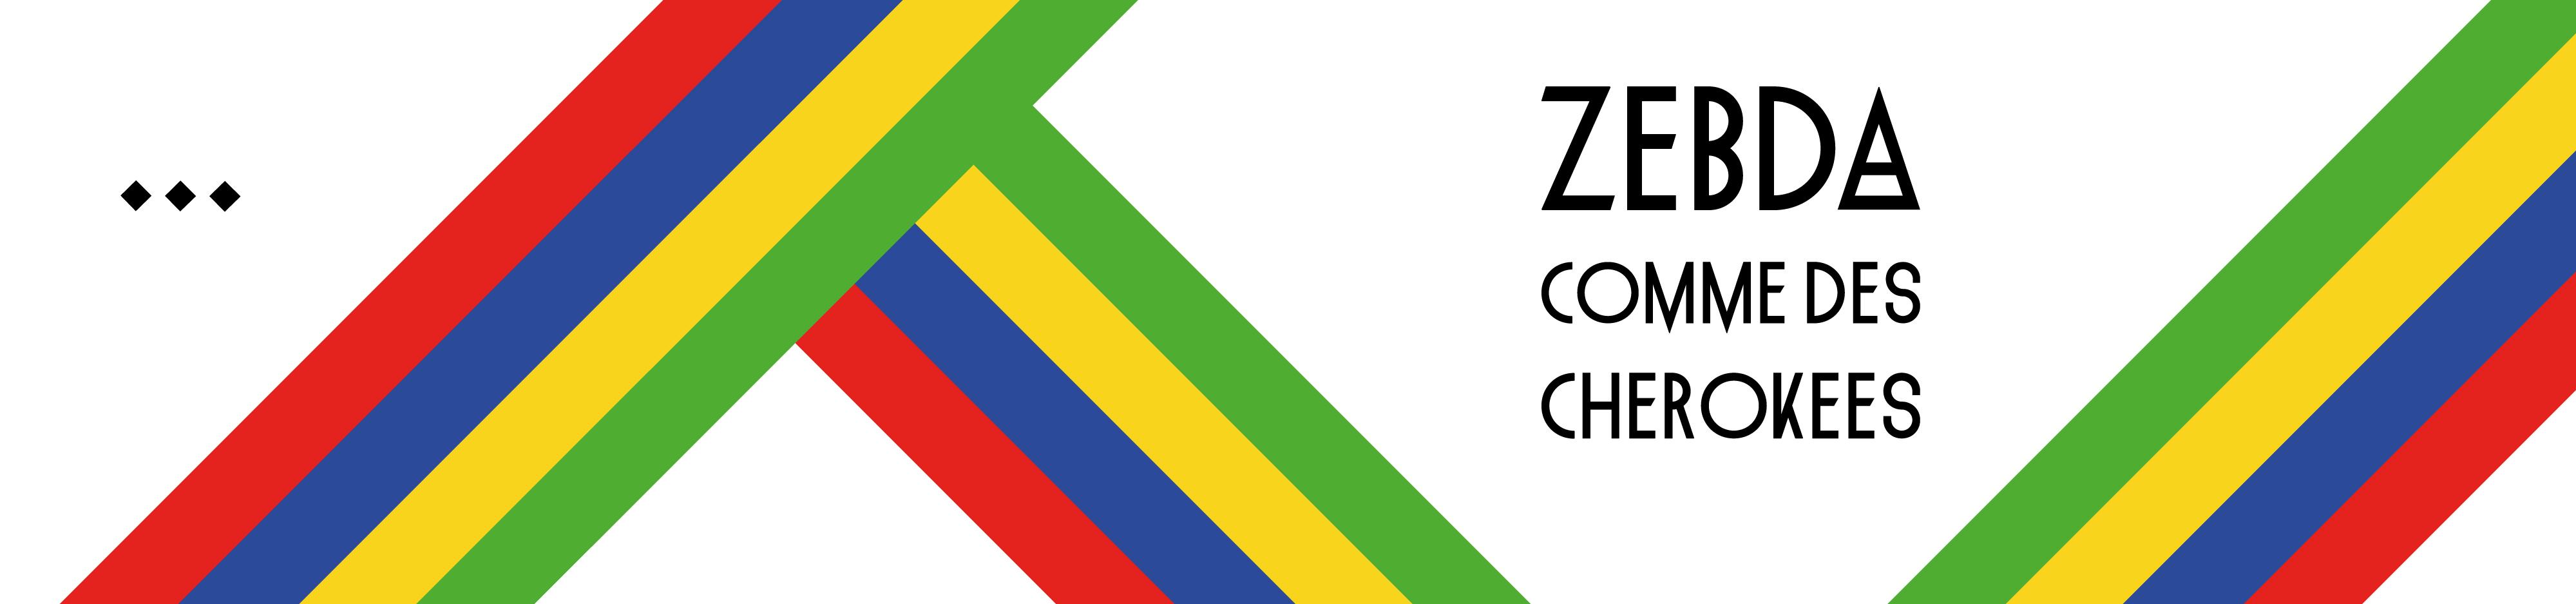 slider-zebda-02